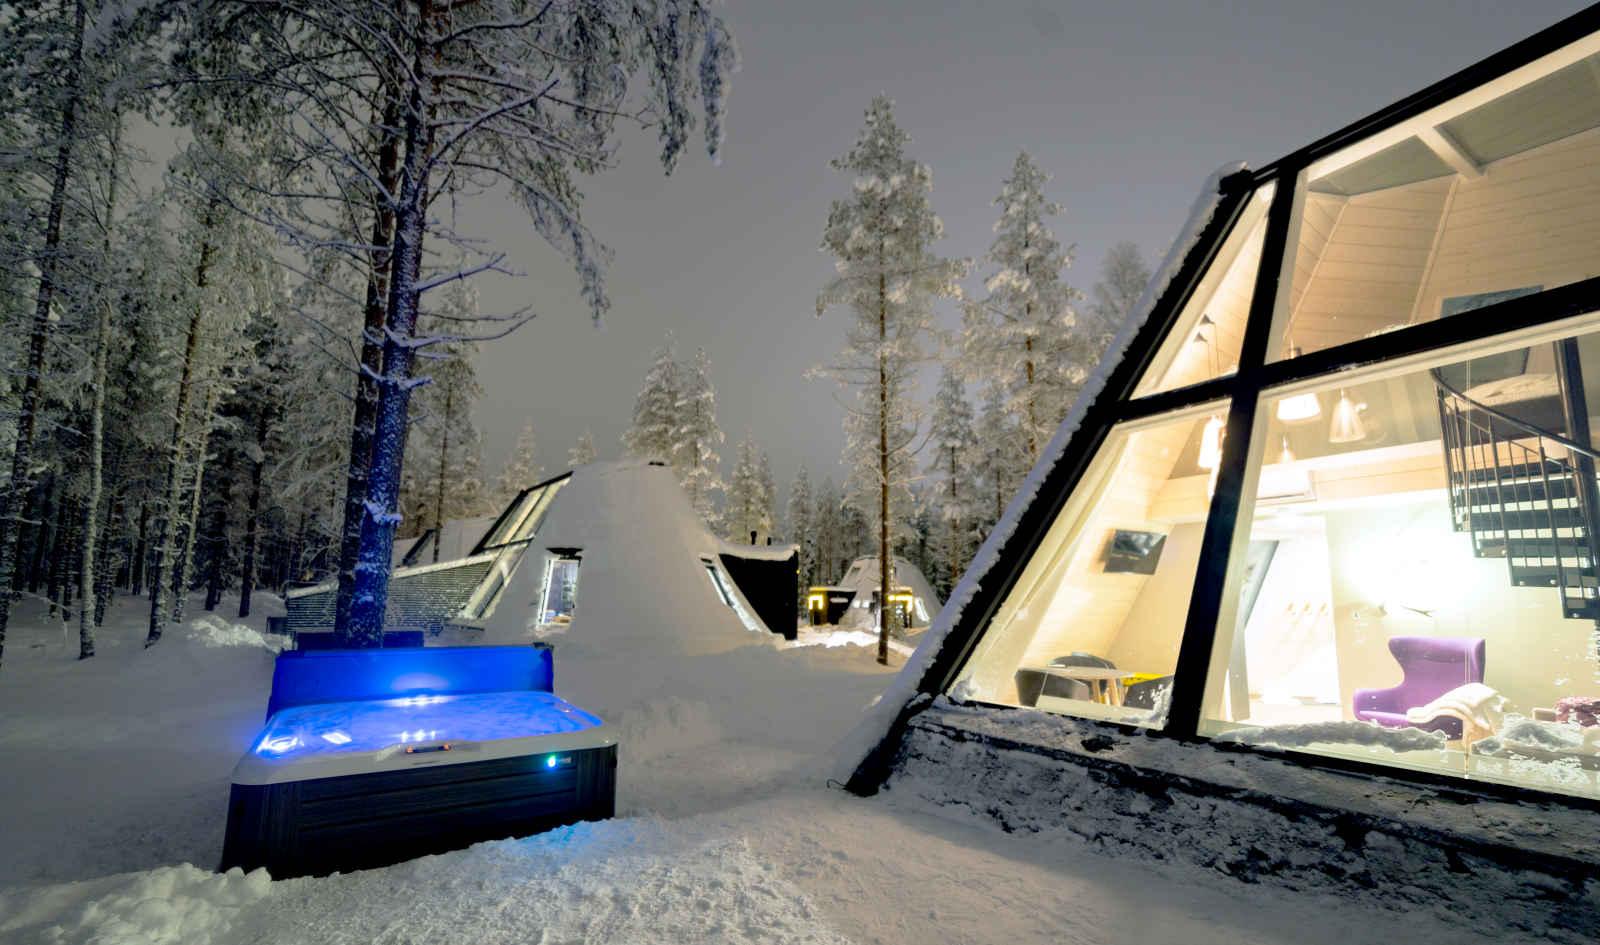 Finlande - Laponie - Rovaniemi - Les Chalets du Glass Resort